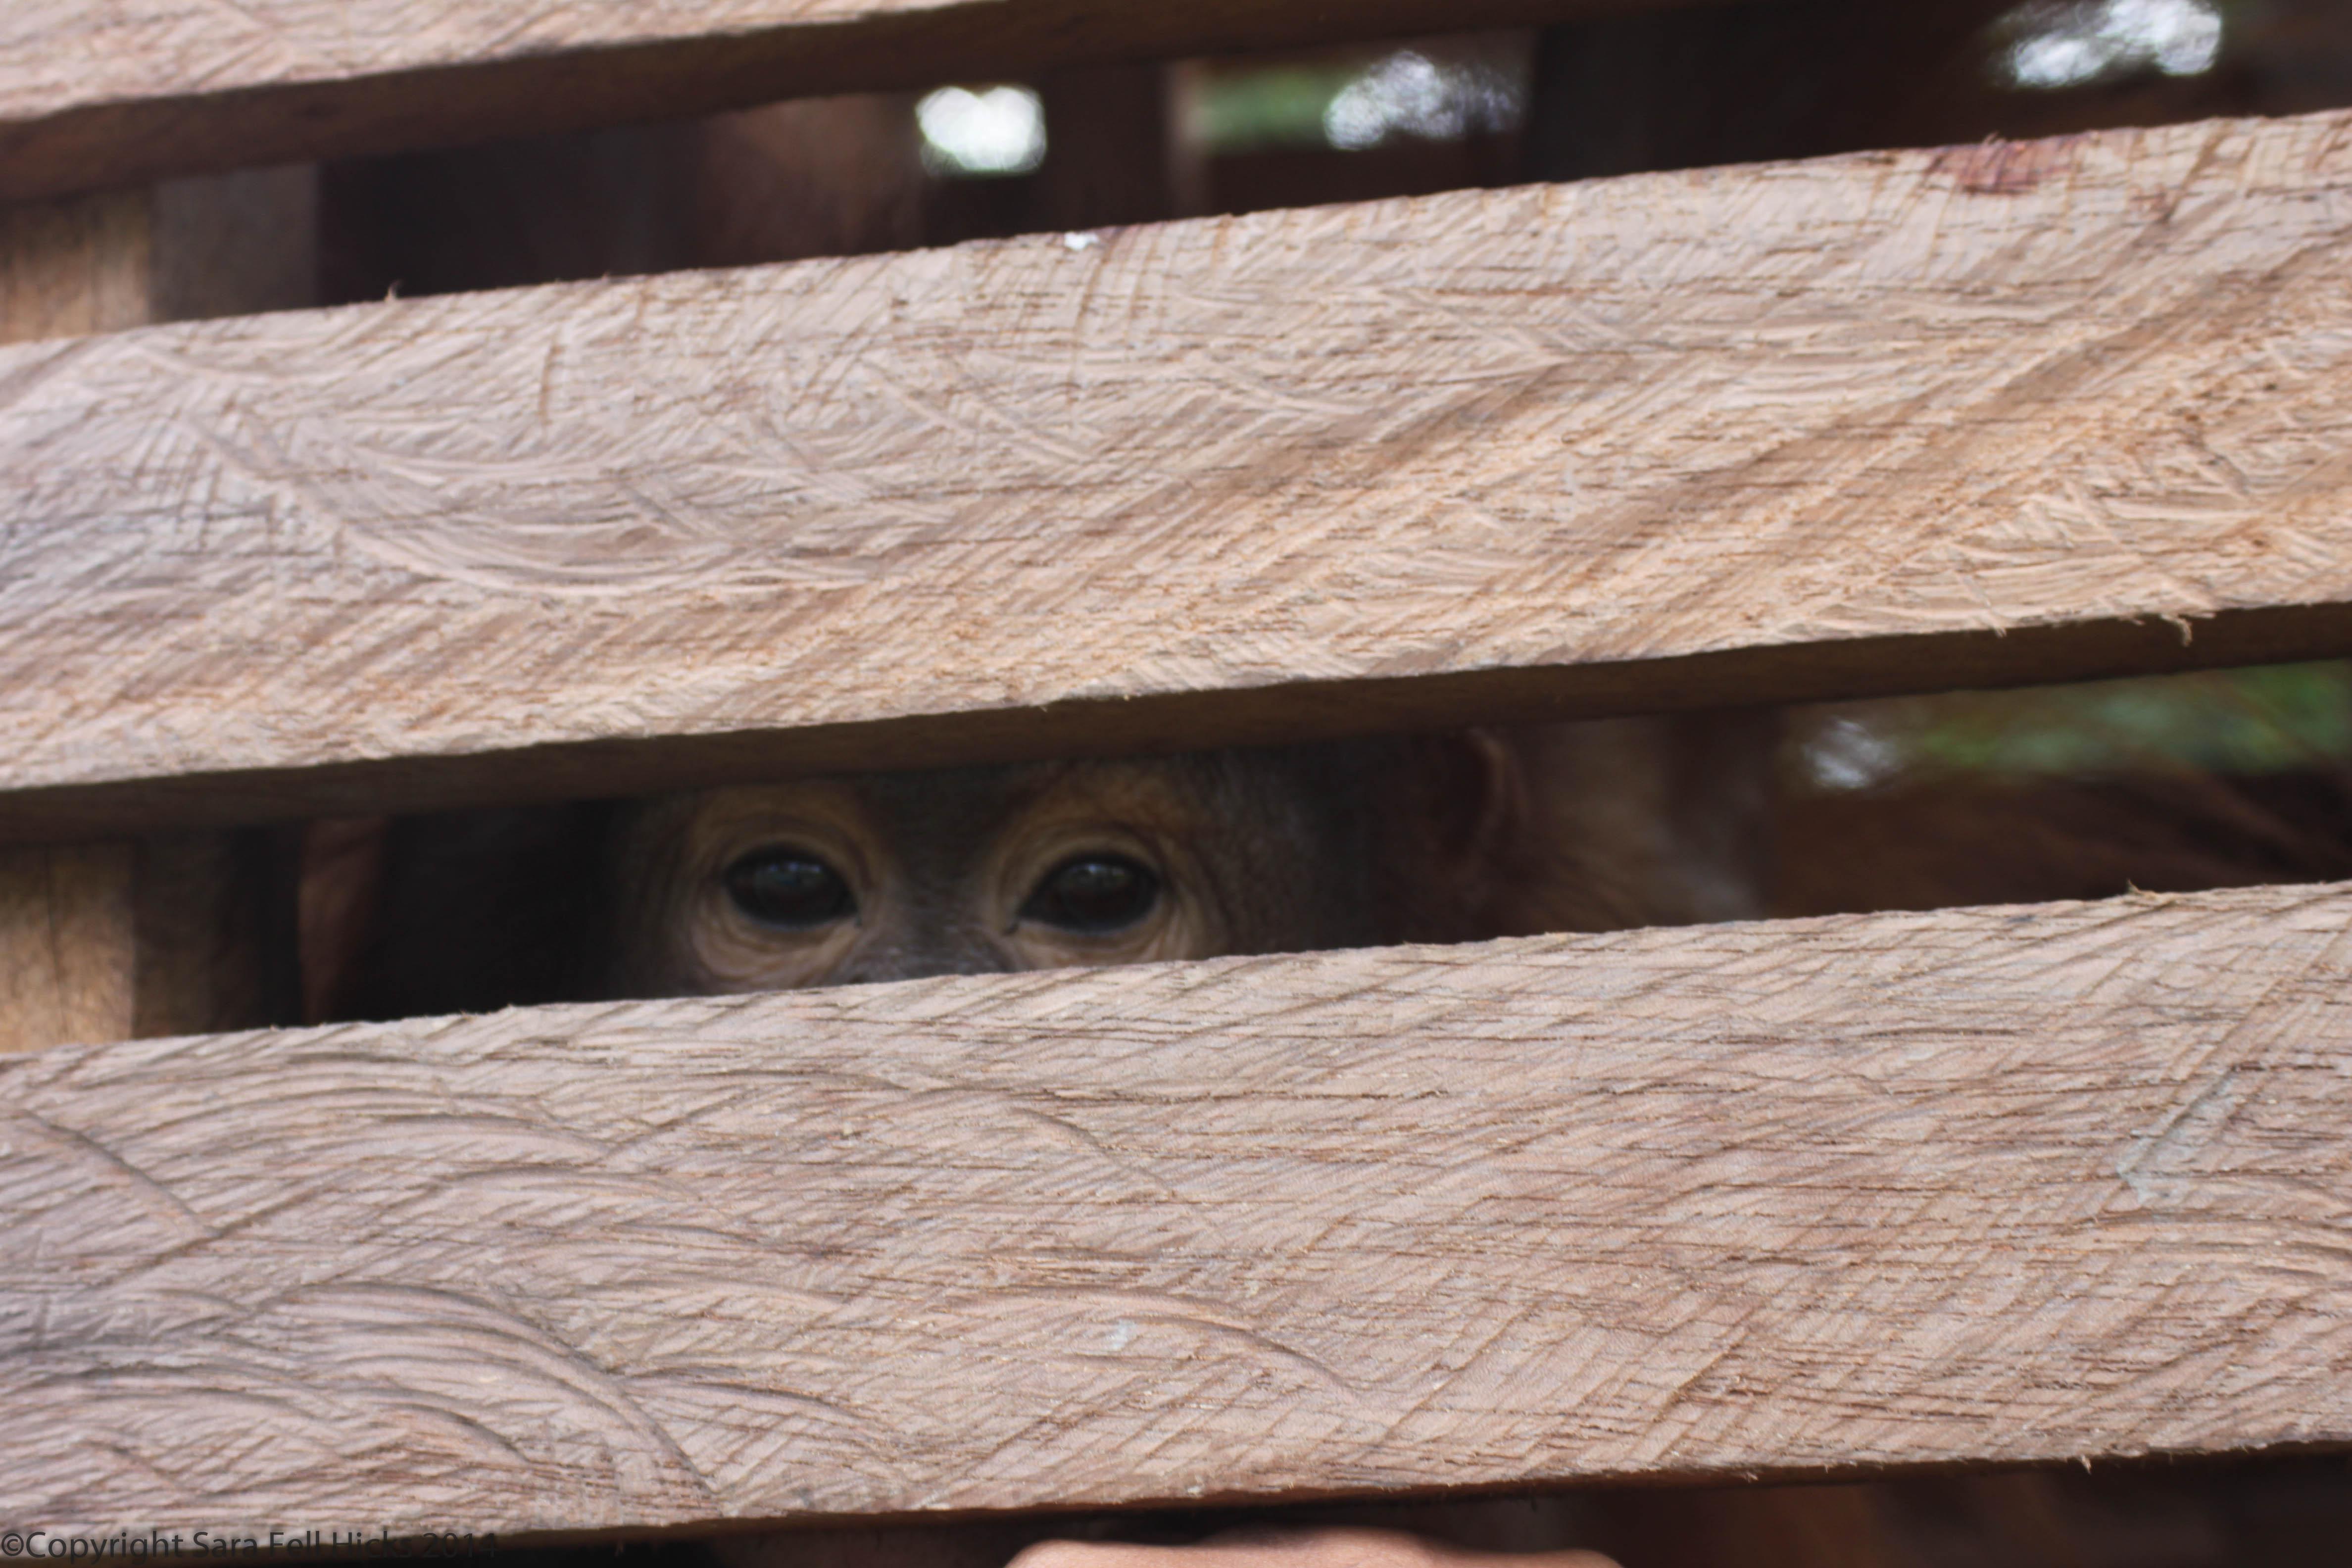 Rescued orangutan